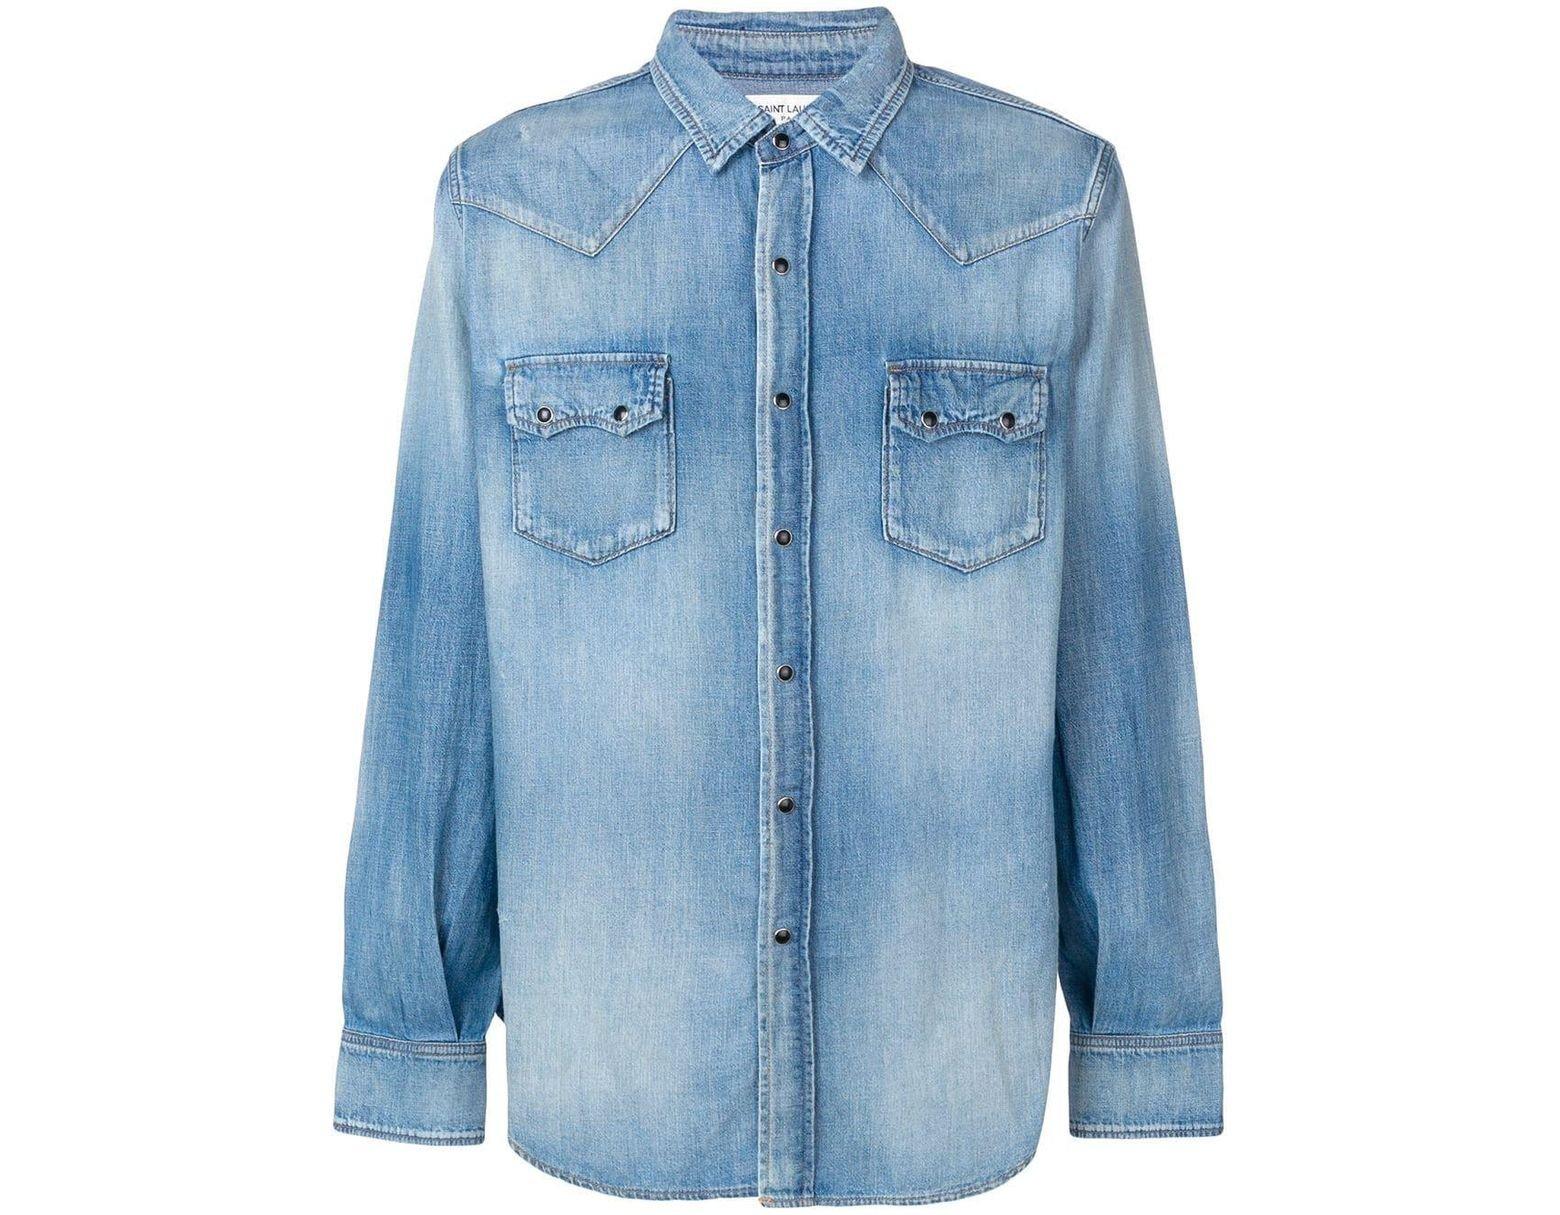 dab777710f Men's Blue Western-style Denim Shirt